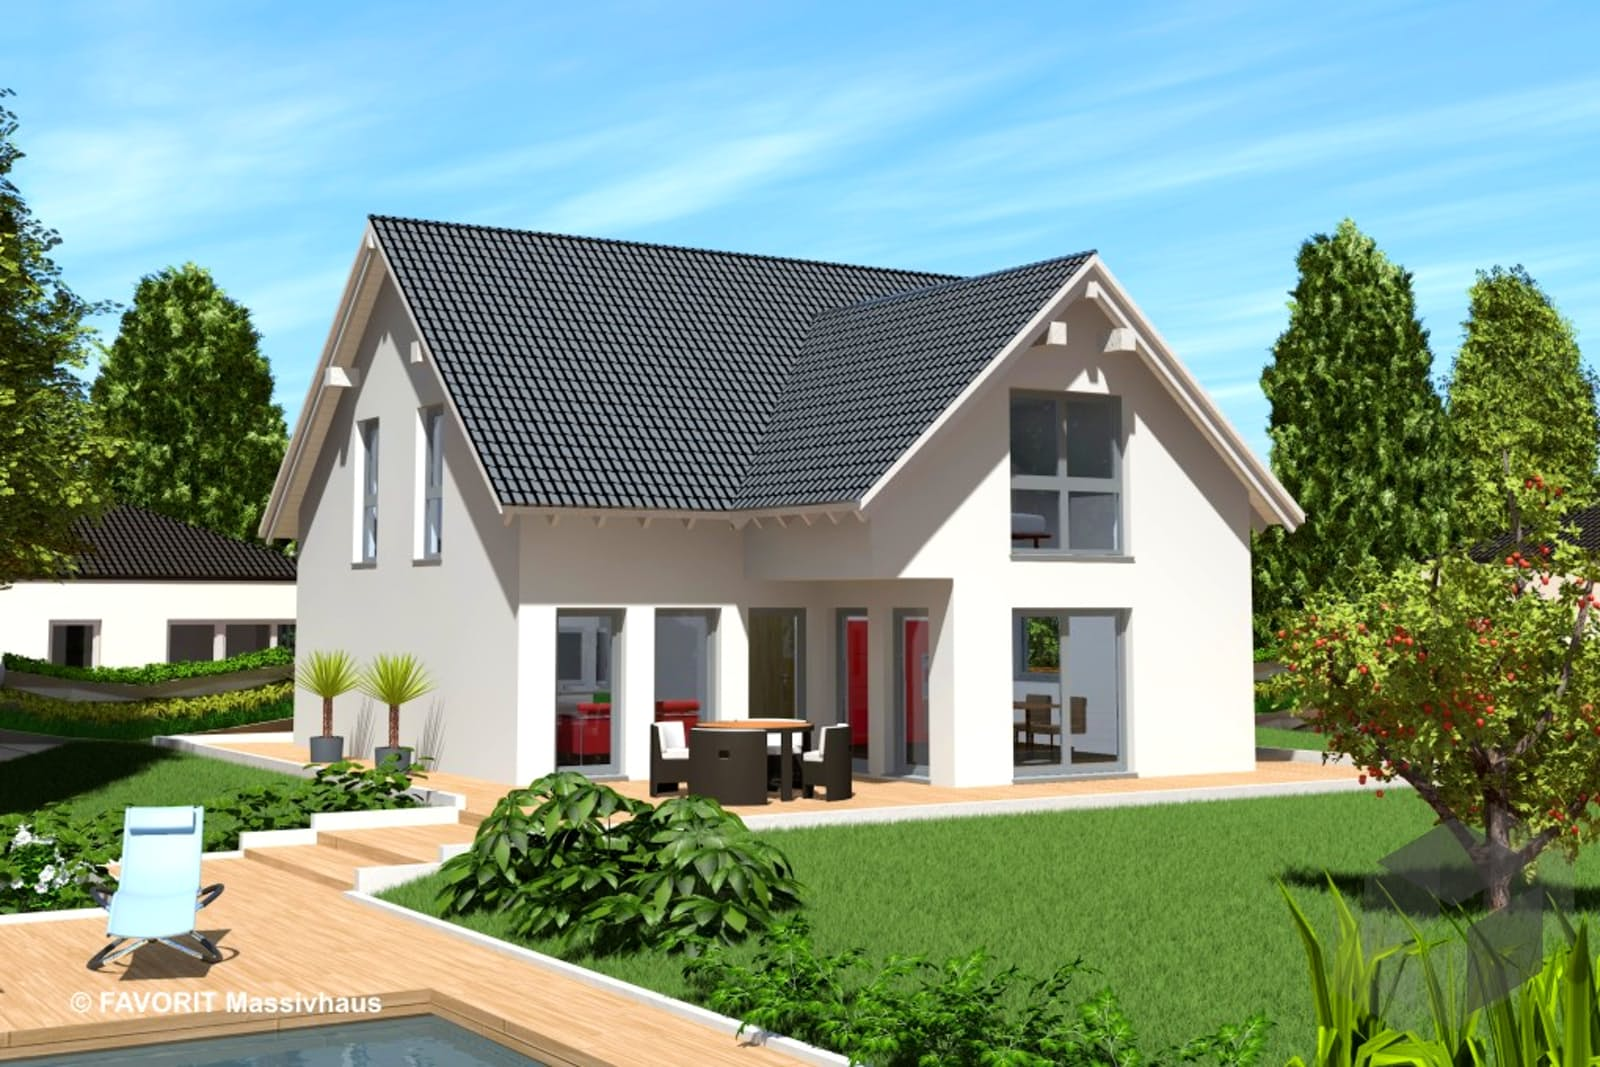 select 168 von favorit massivhaus komplette daten bersicht. Black Bedroom Furniture Sets. Home Design Ideas